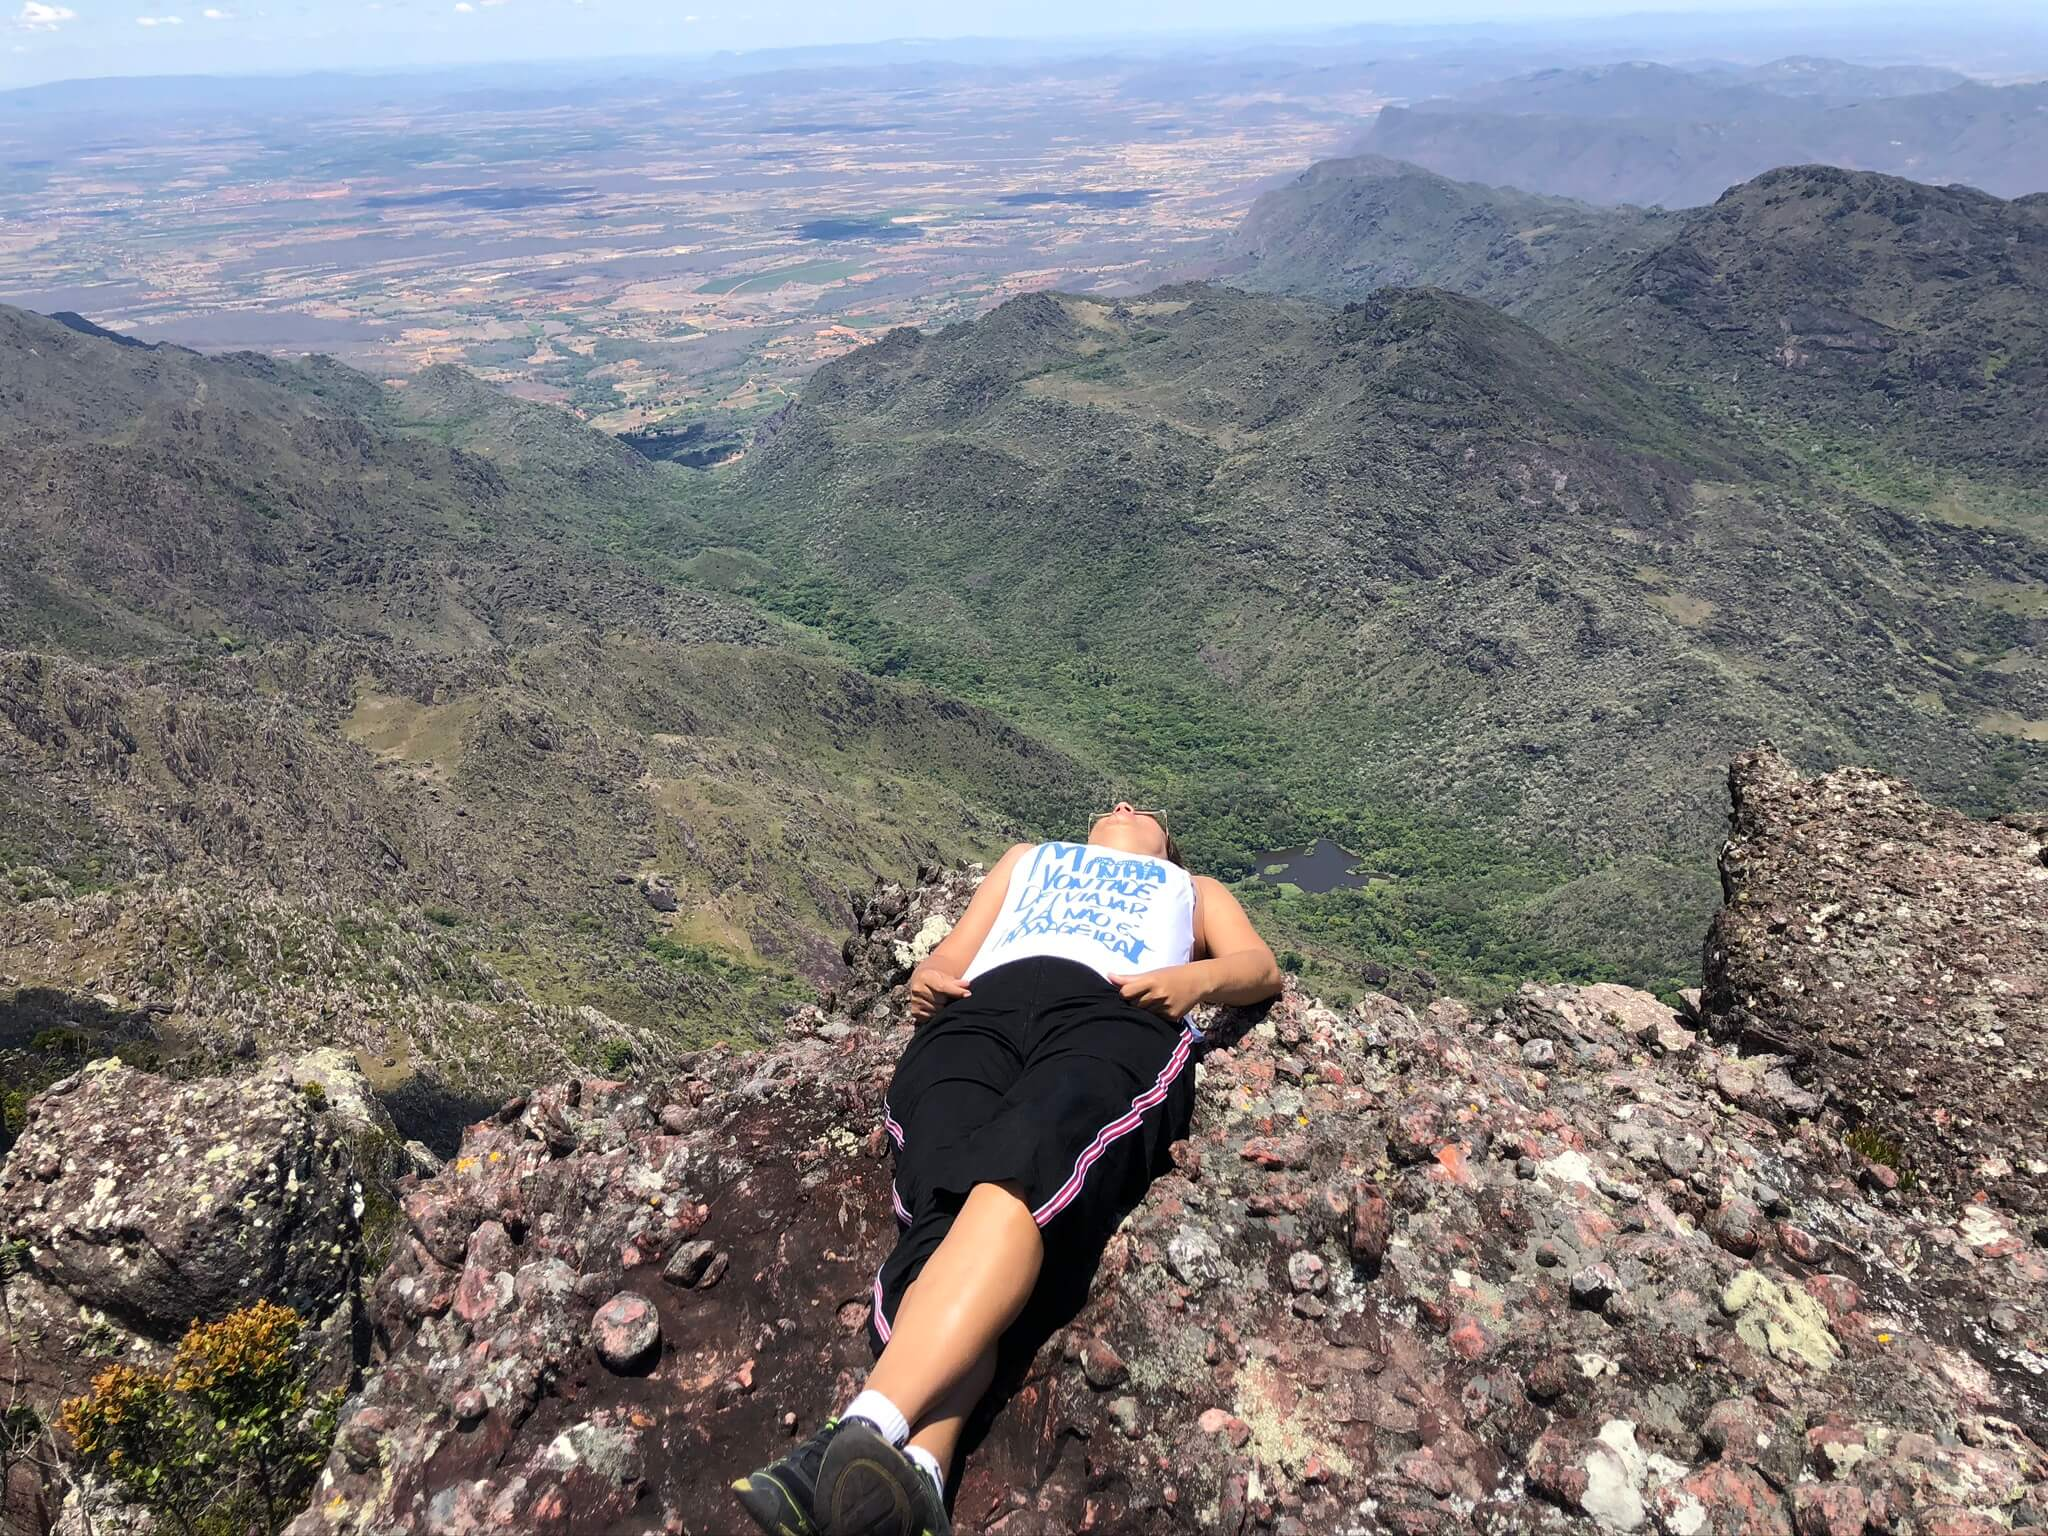 Contemplando a maravilha da natureza no Pico das Almas